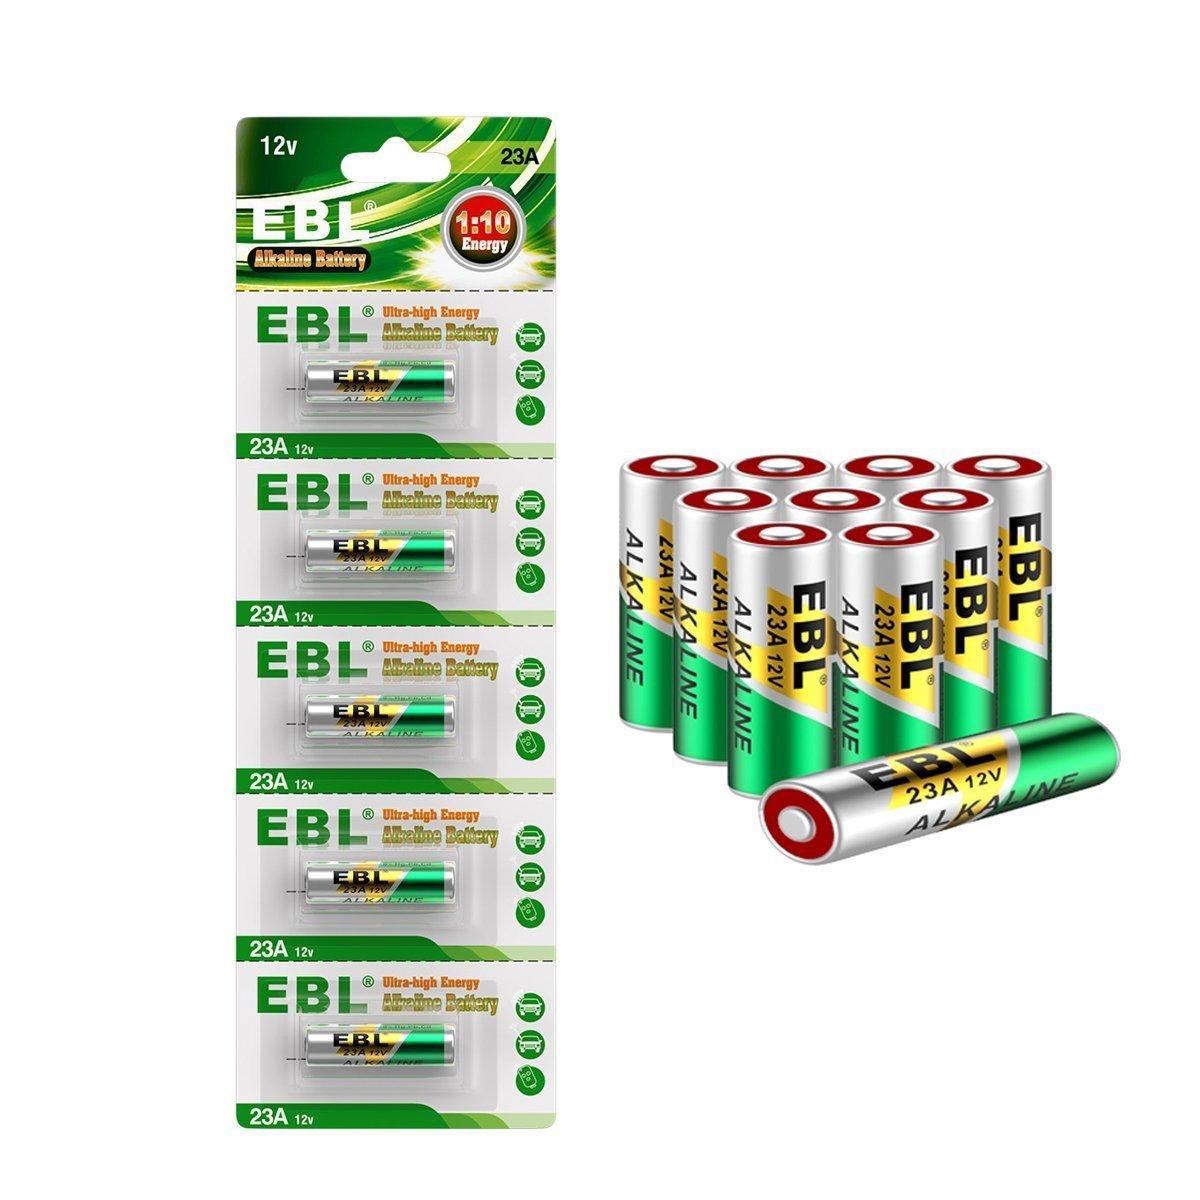 EBL 10 Piezas A23 23A GP23AE MN21 23GA 12V Pila Alcalina